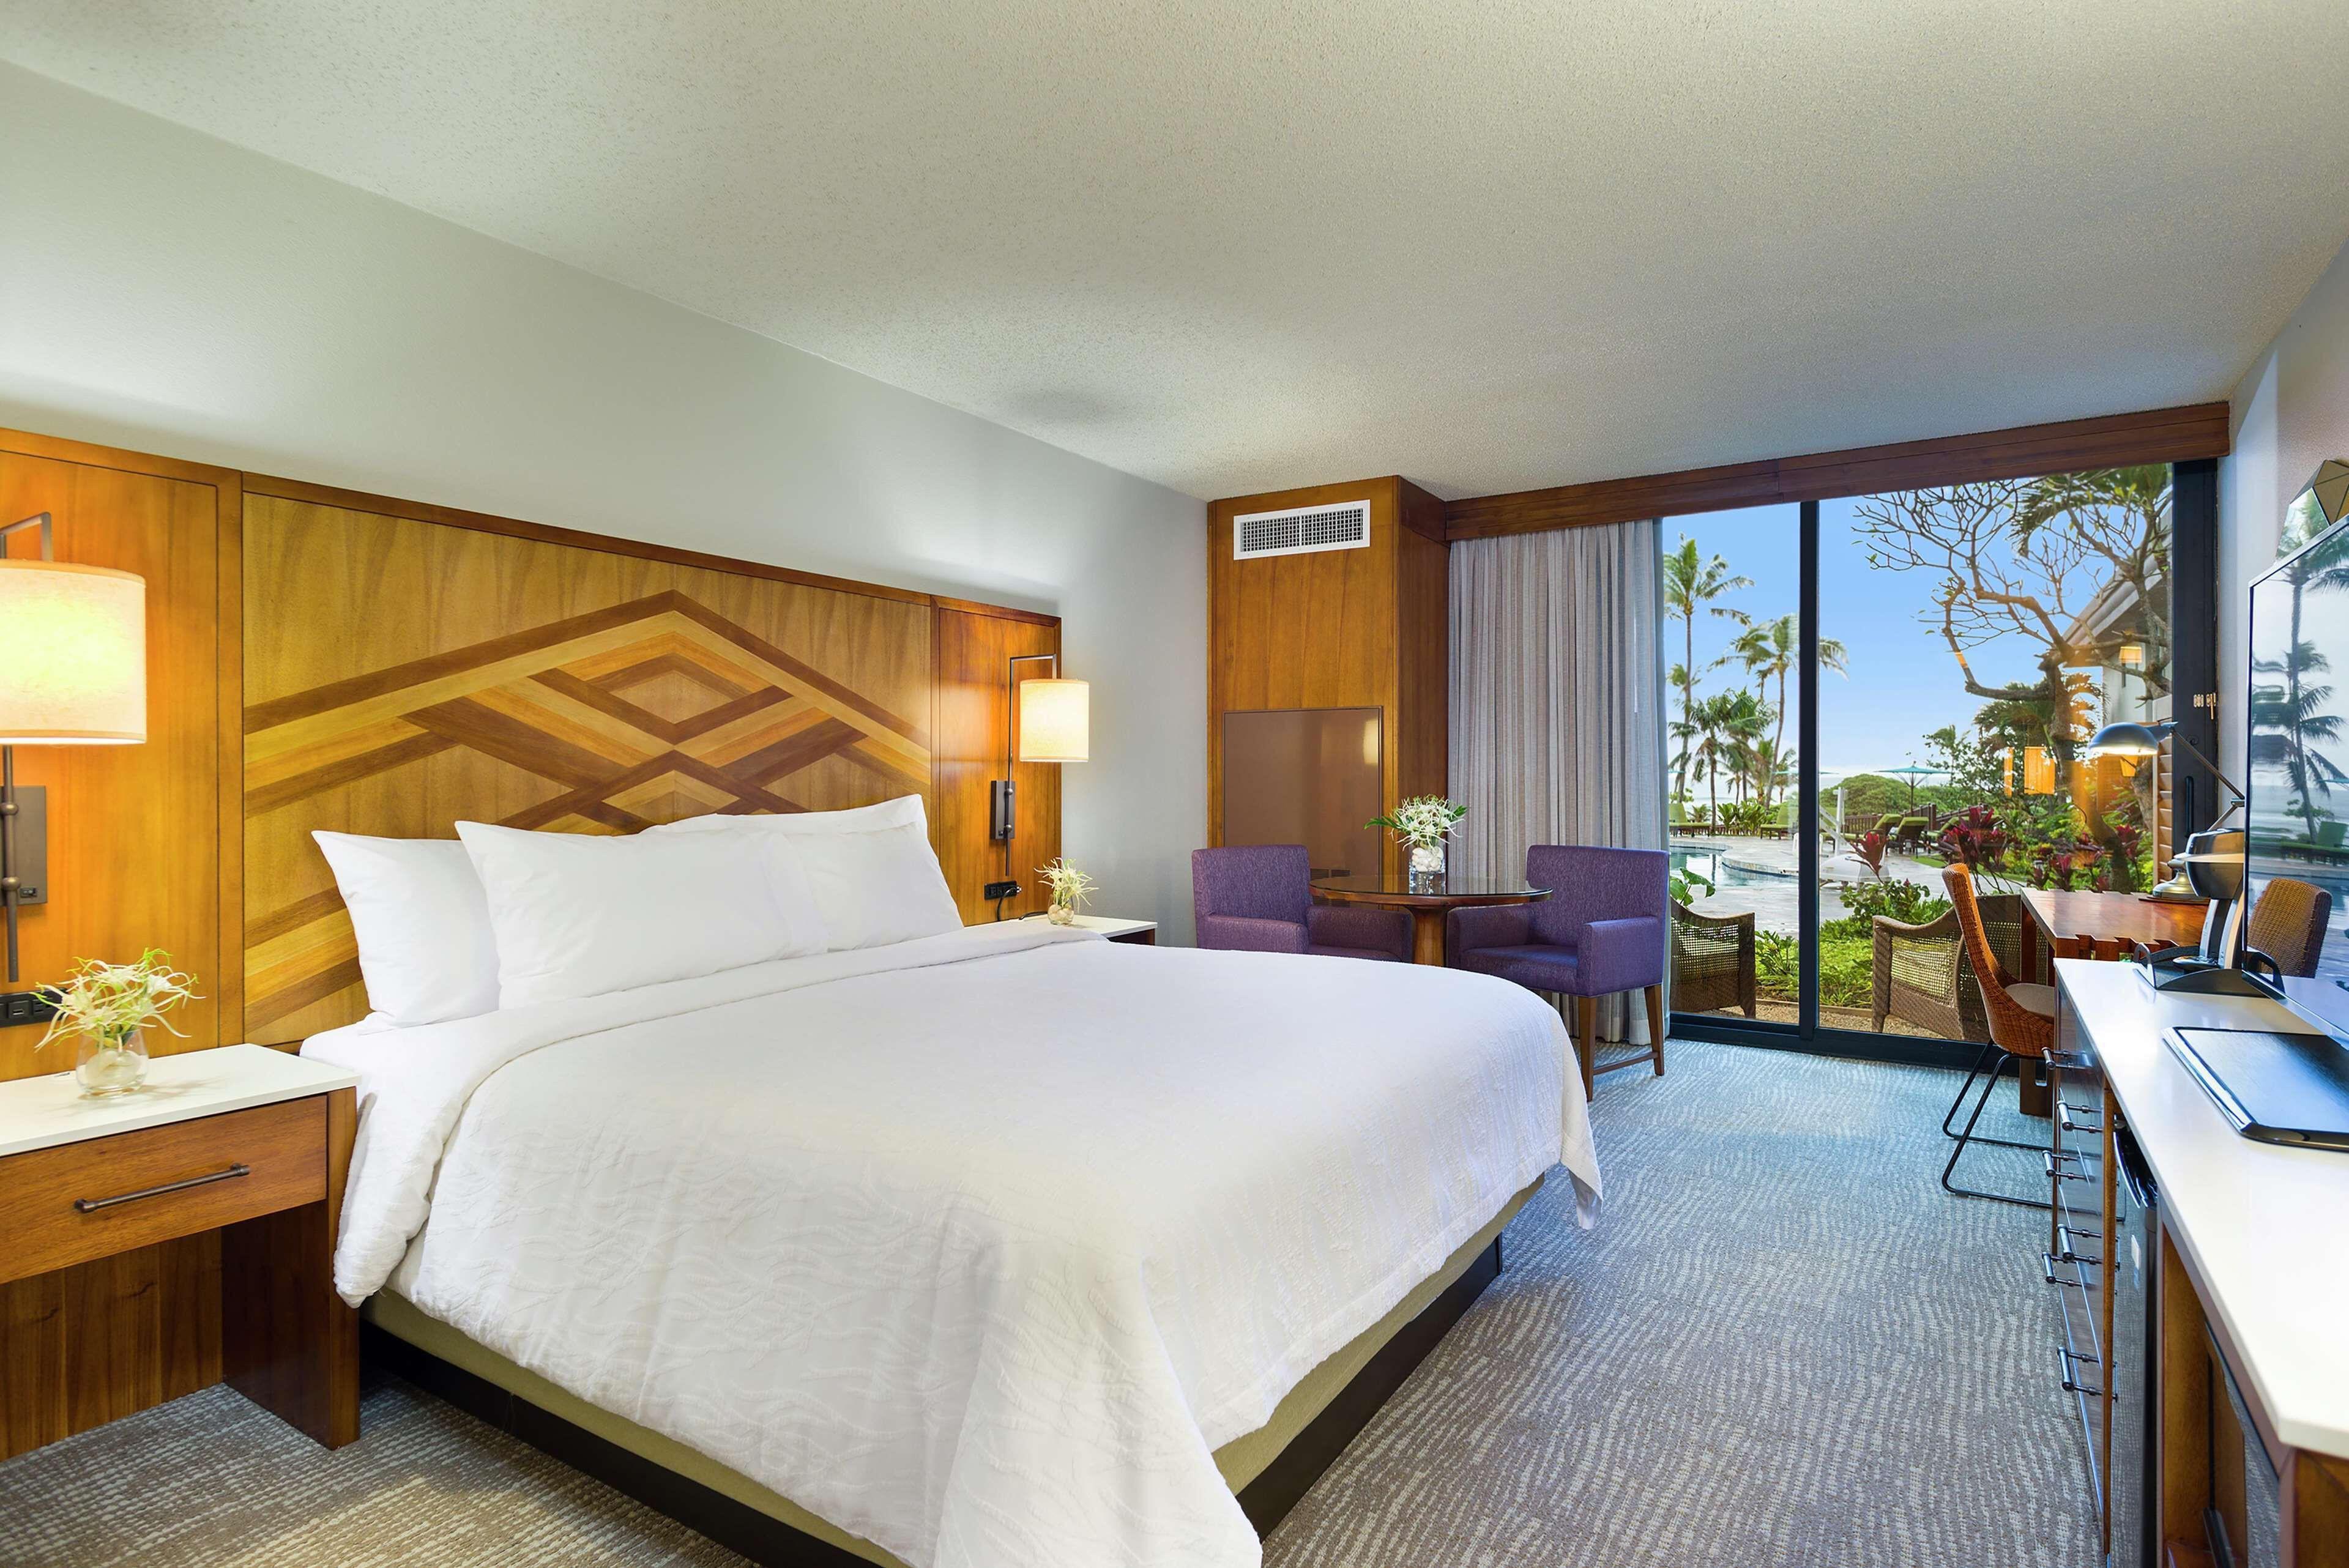 Courtesy of Hilton Garden Inn Kauai Wailua Bay / Expedia.com